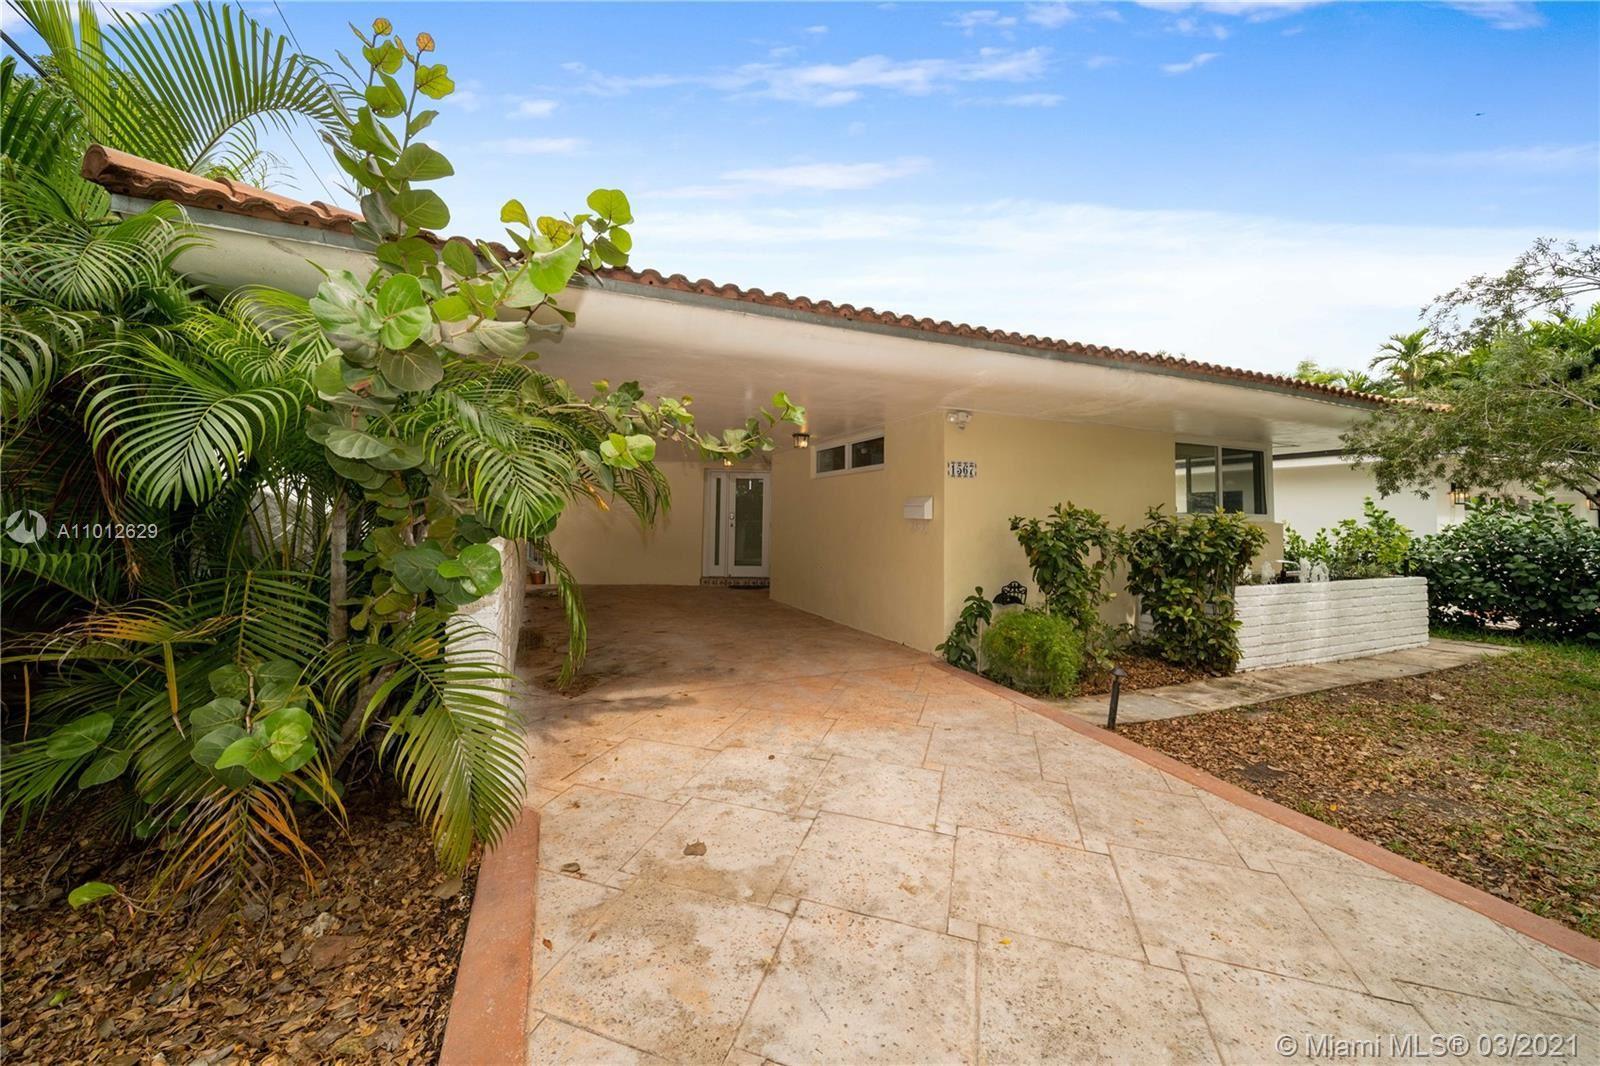 1567 Plasentia Ave, Coral Gables, FL 33134 - #: A11012629